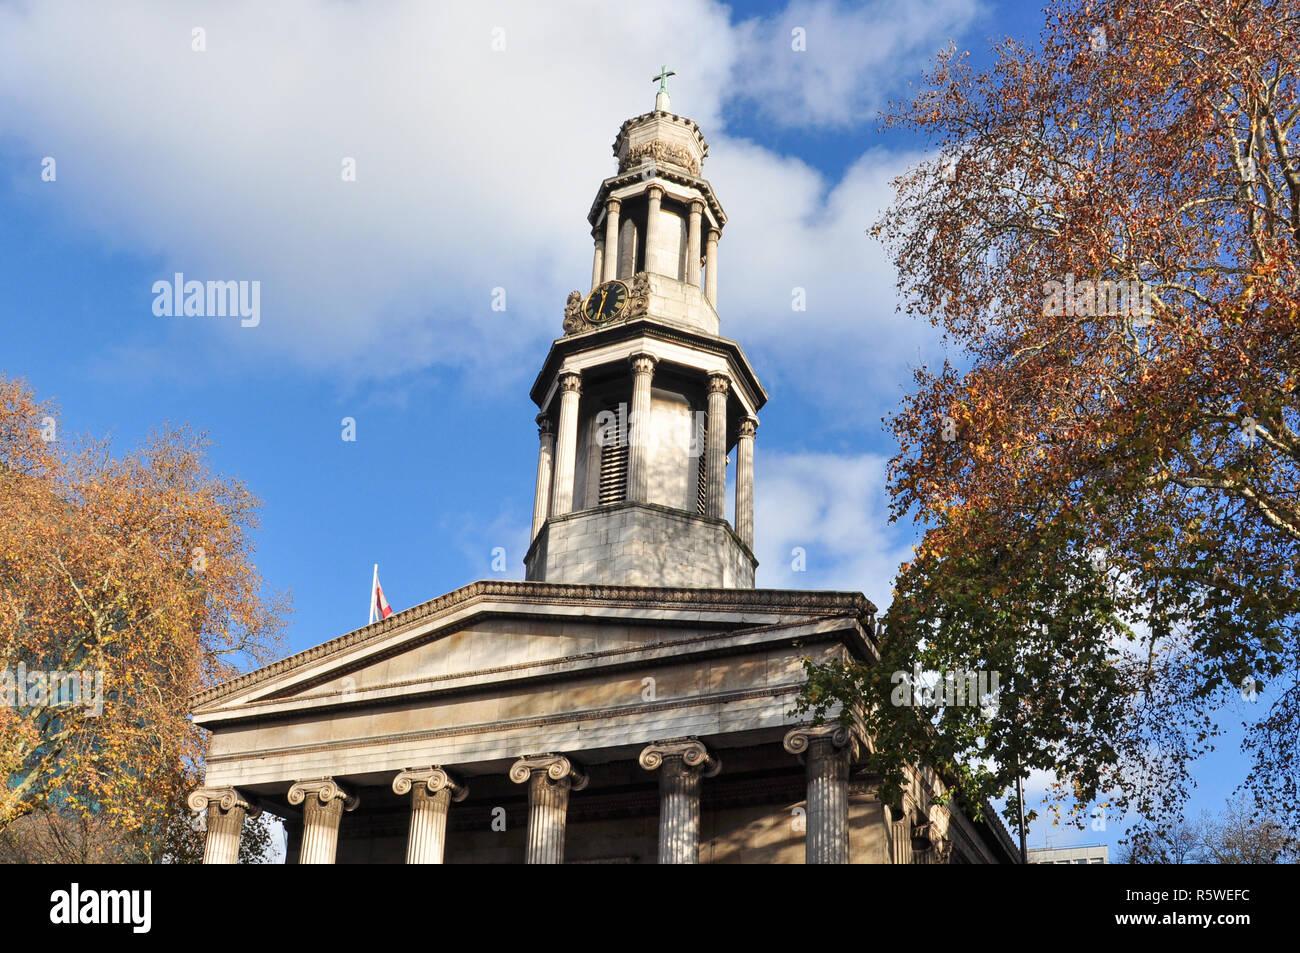 St Pancras New Church, Euston Road, London, England, UK - Stock Image